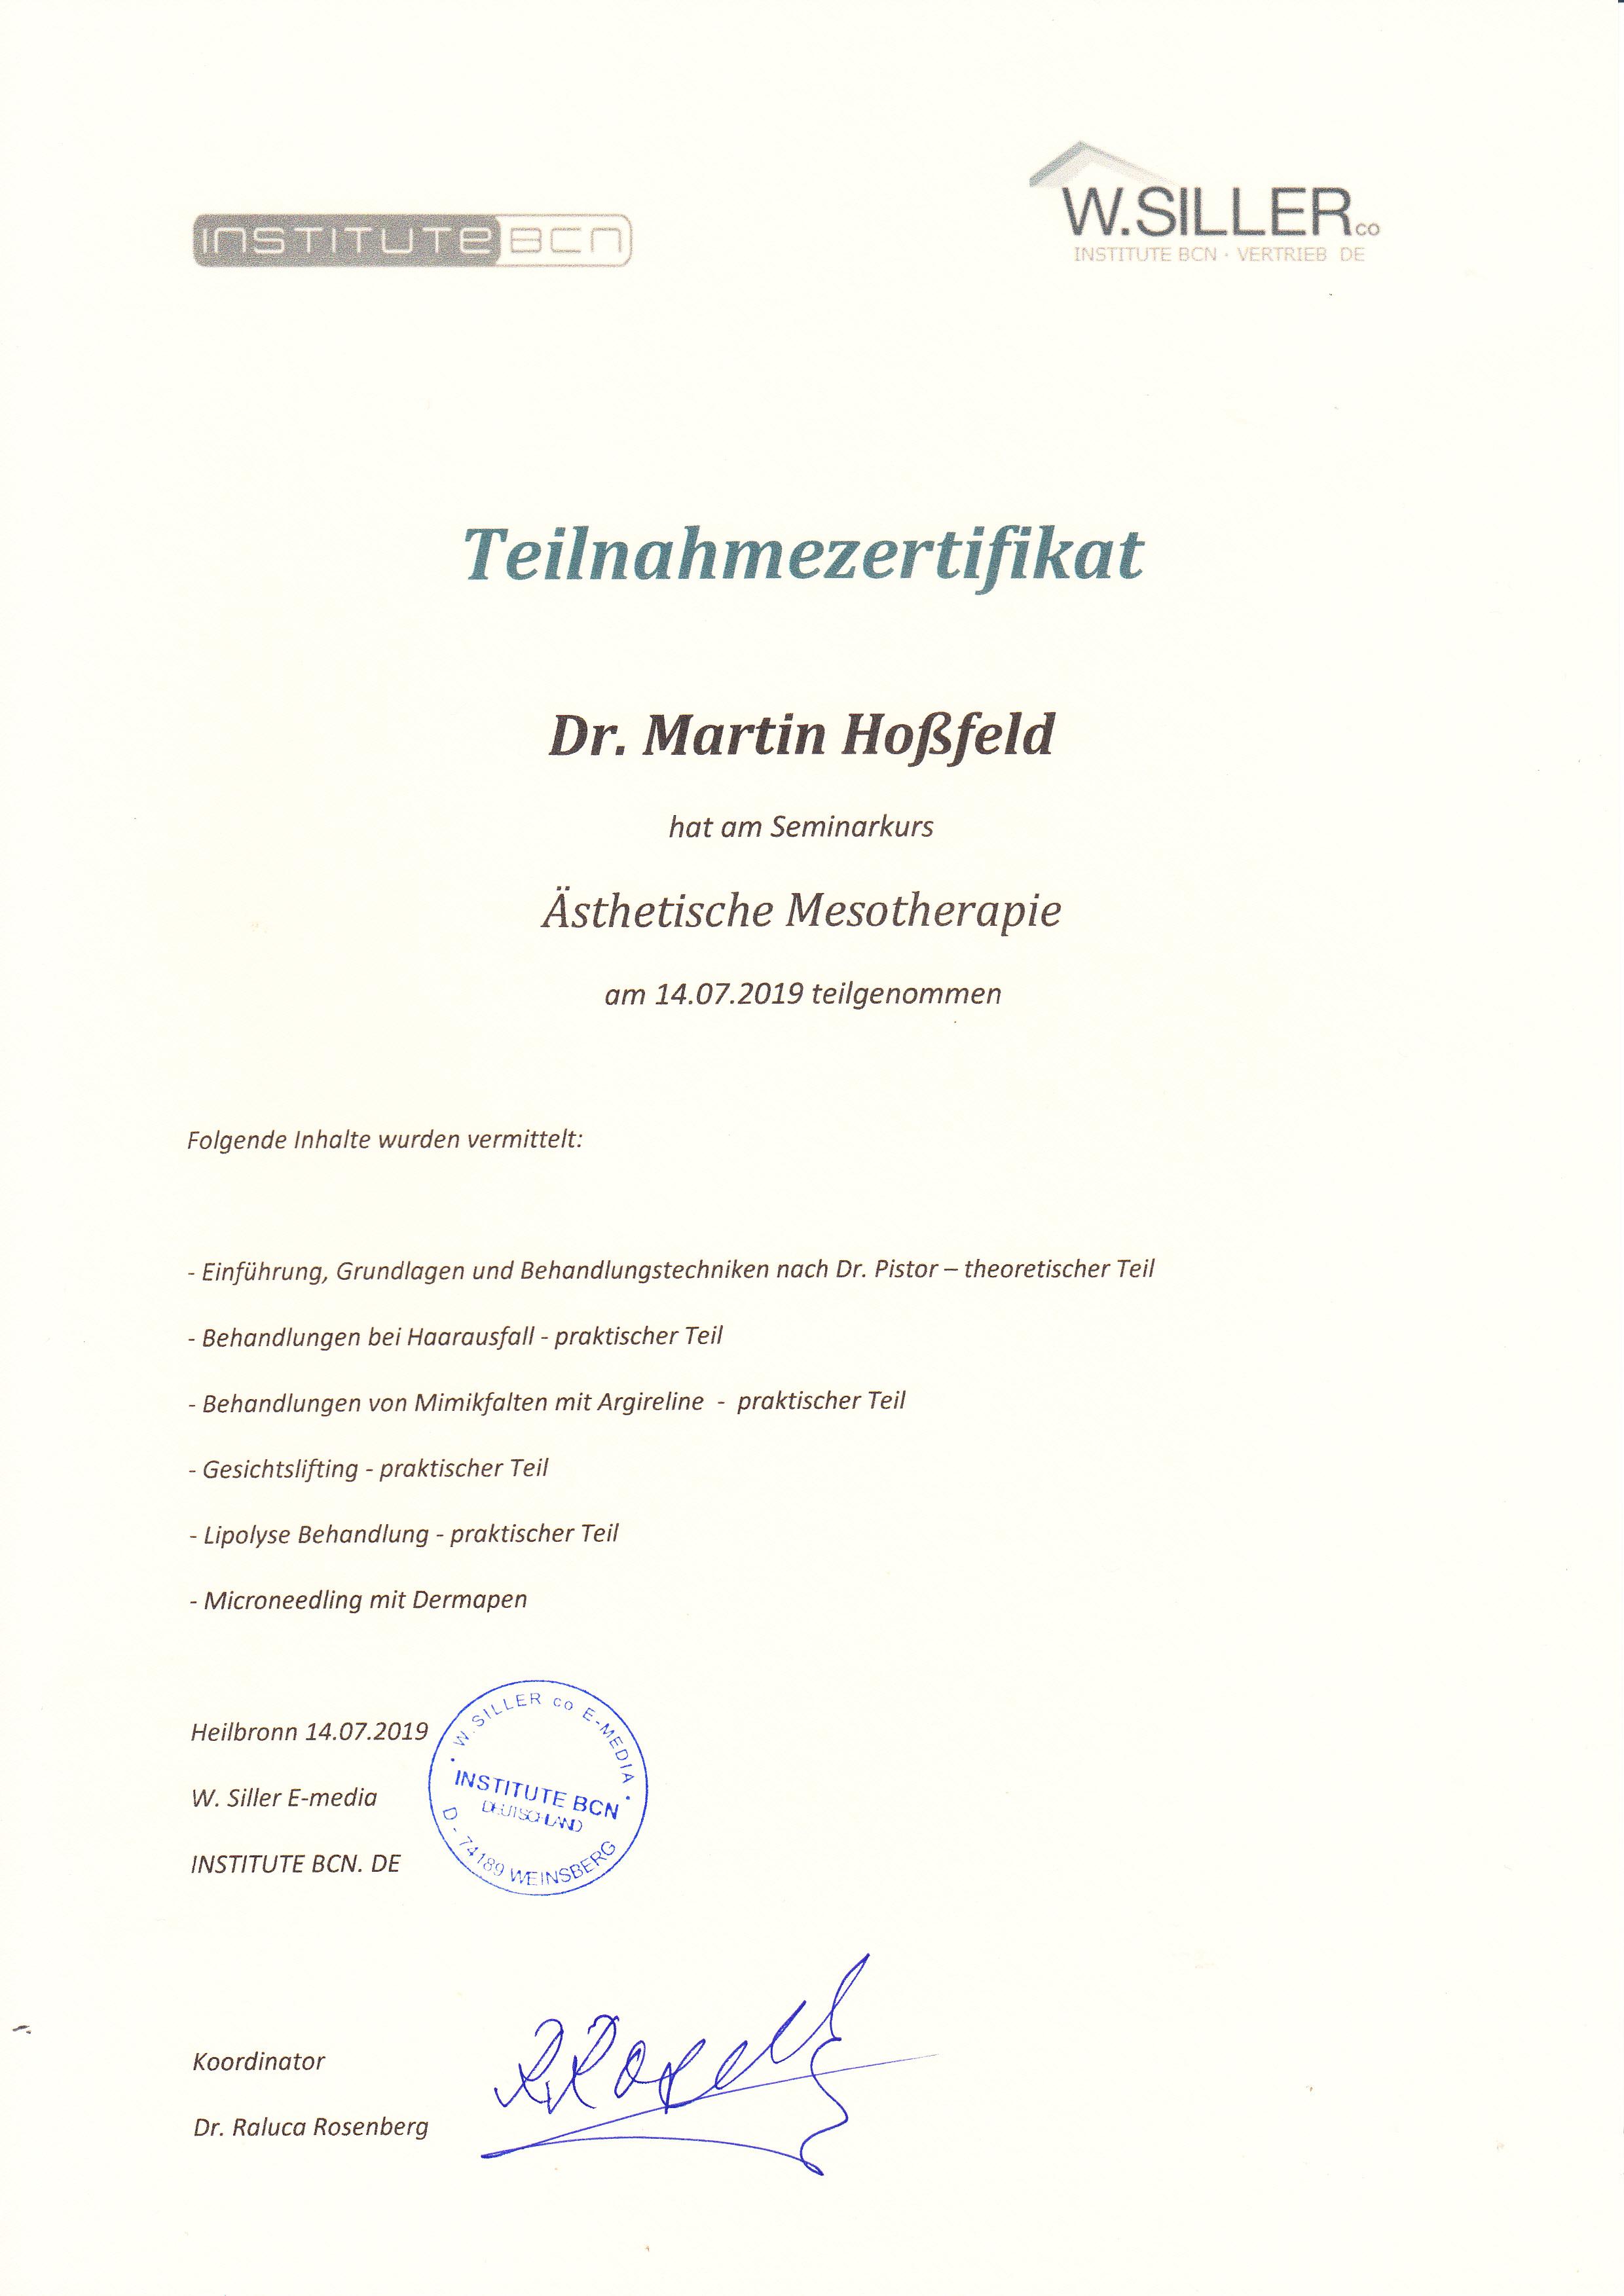 Fortbildung Mesotherapie Institute BCN Heilbronn